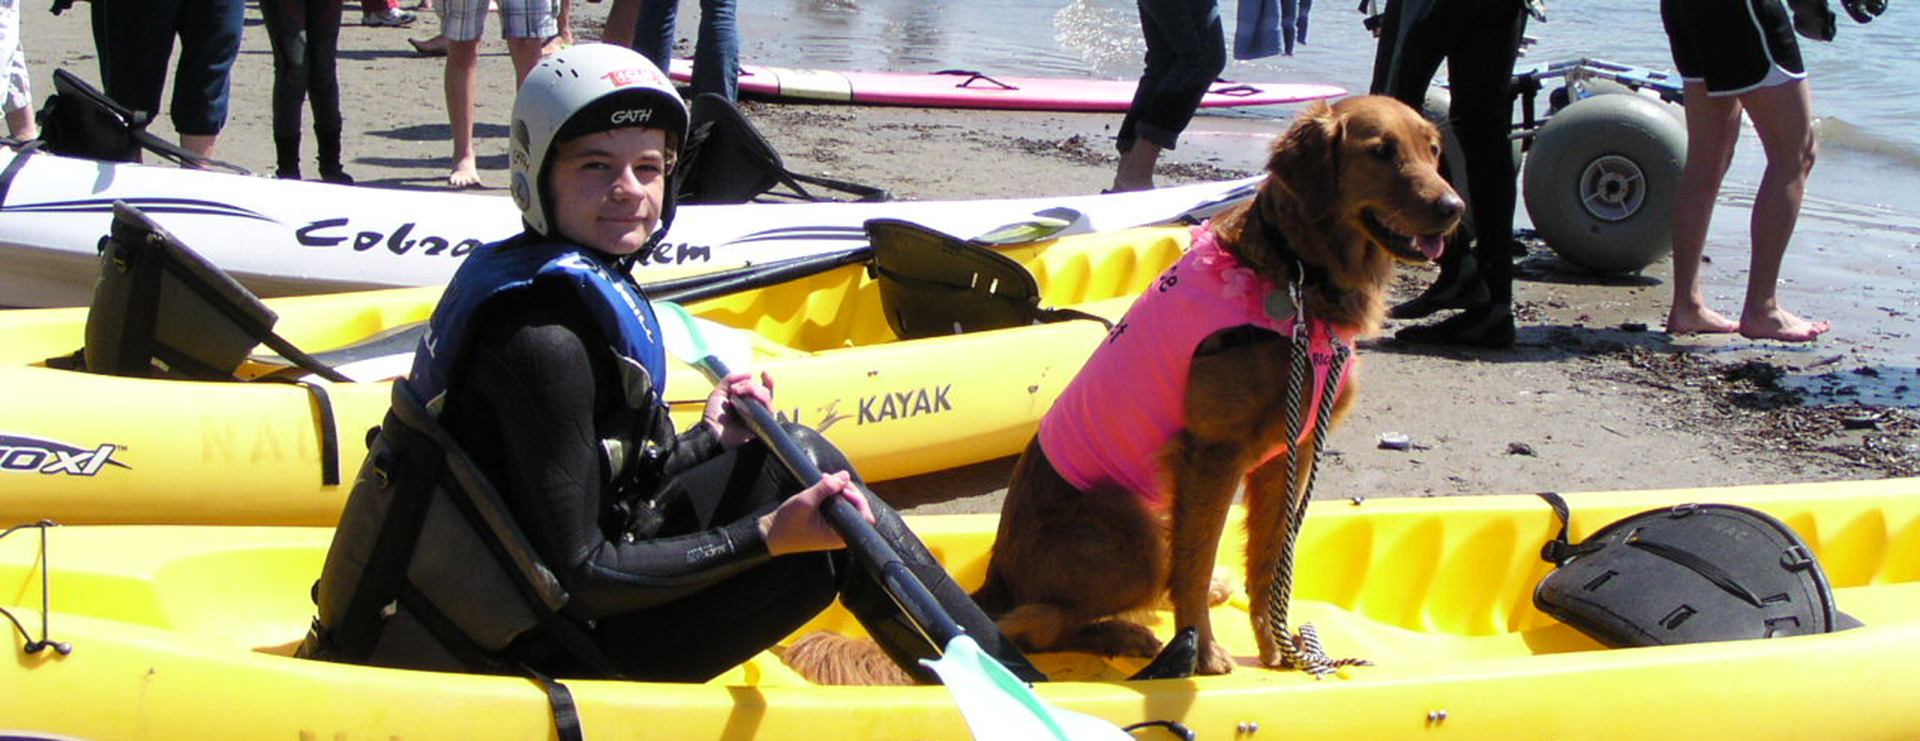 ricochet-kayak